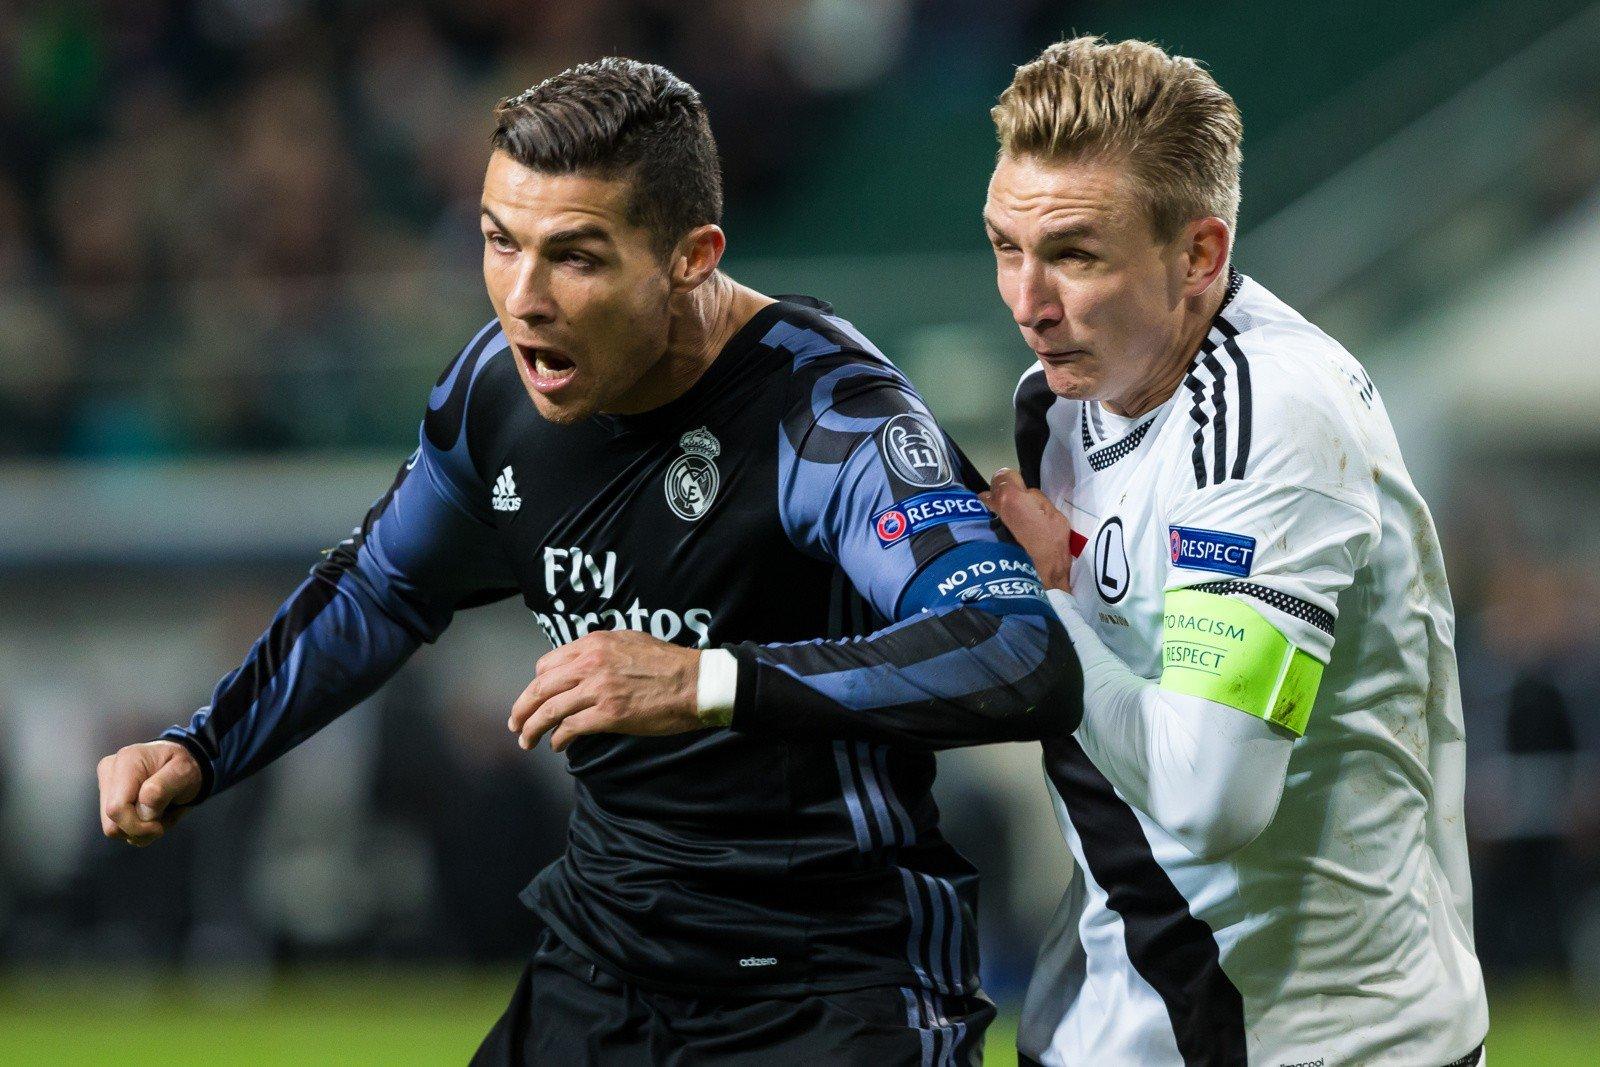 e10761a59 Liga Mistrzów: Real - Atletico 3:0. Hat-trick Cristiano Ronaldo w ...